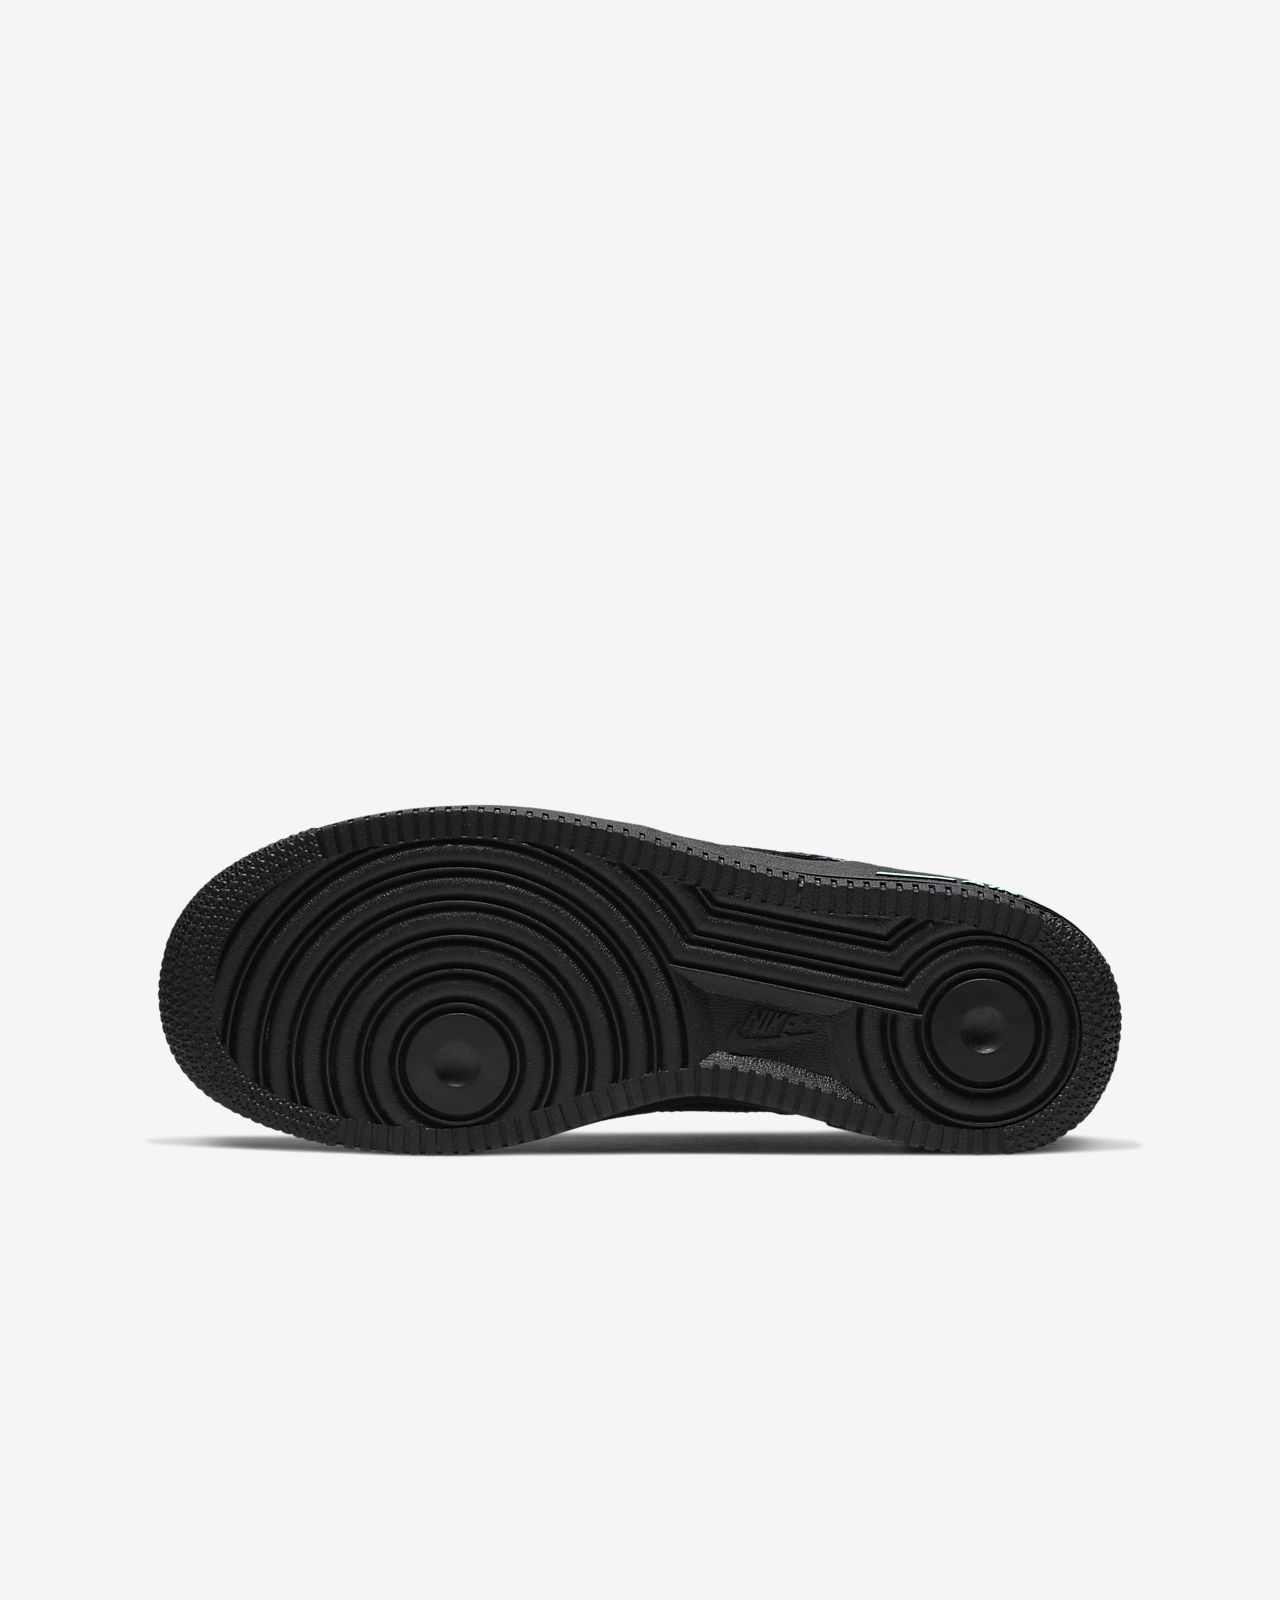 ältere Schuh Kinder Force 1 SE Air für Nike 08nPkwO